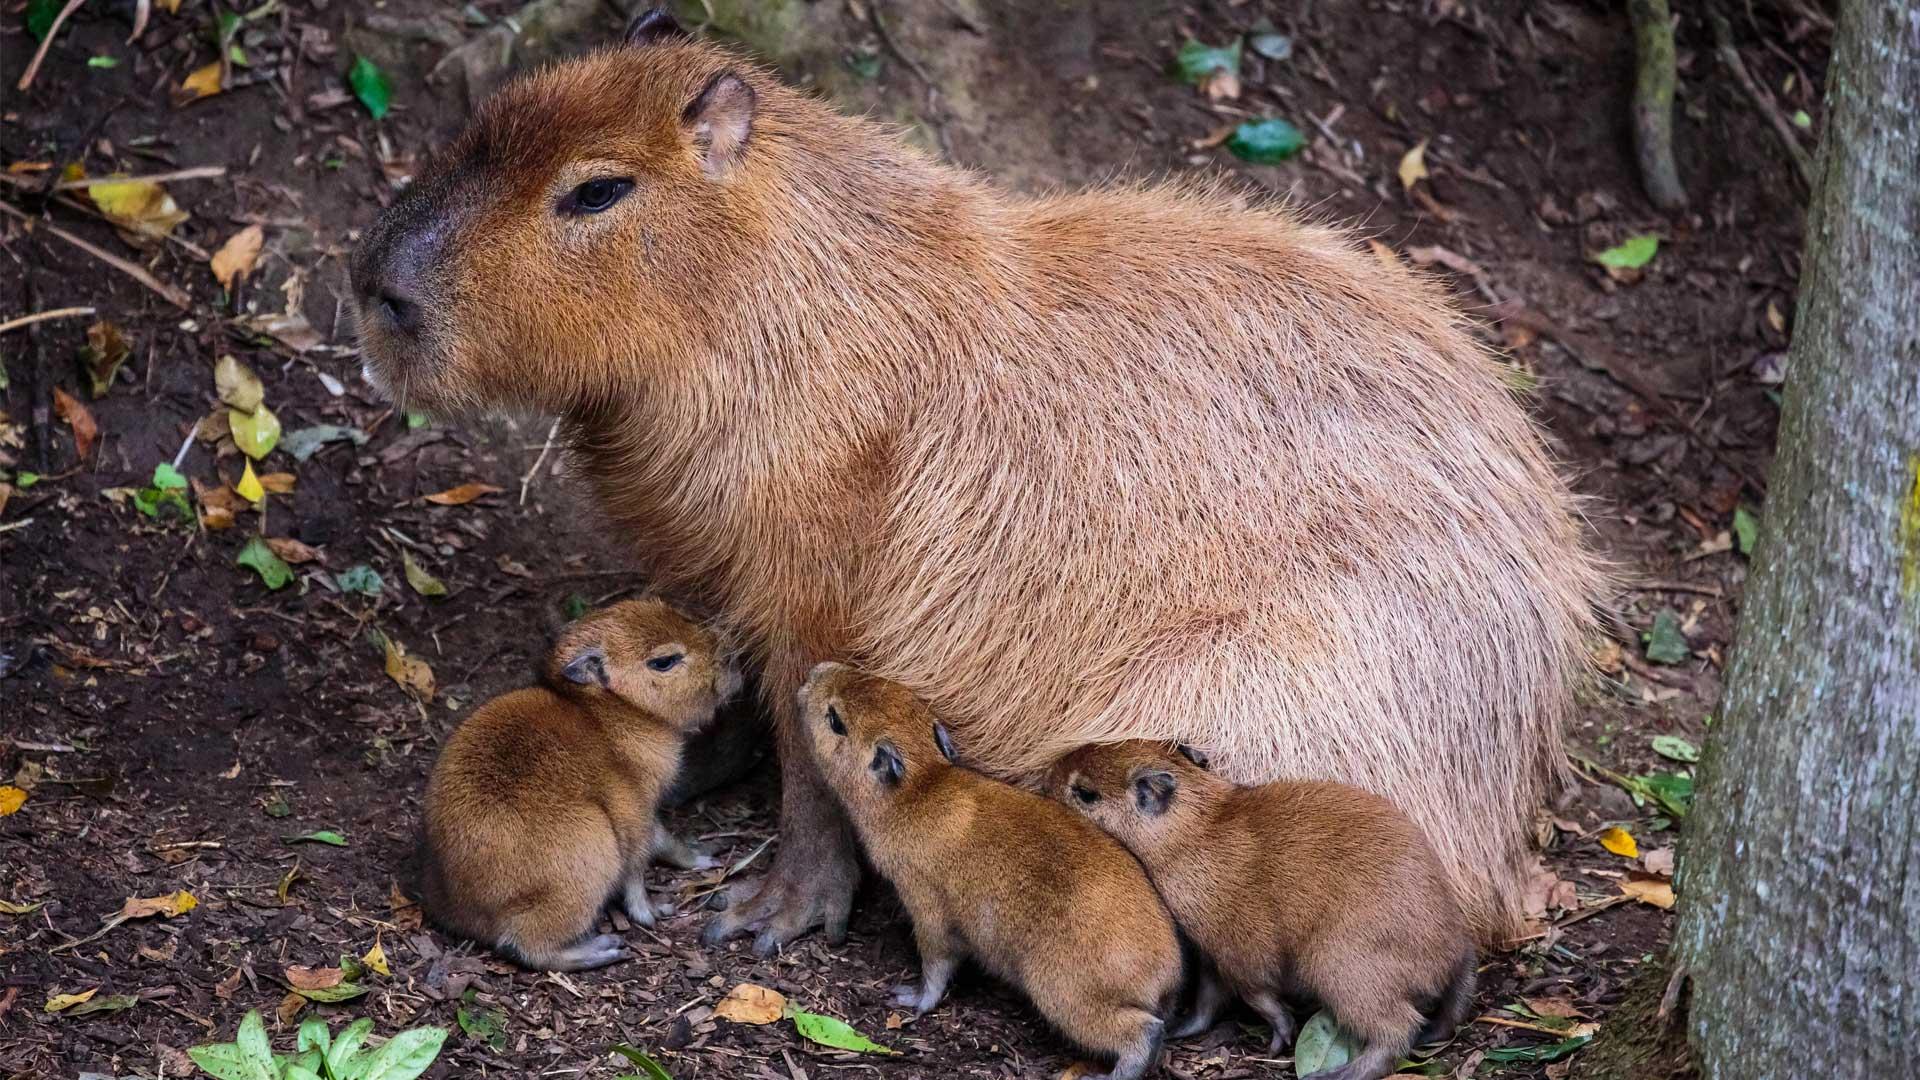 https://rfacdn.nz/zoo/assets/media/capybara-with-pups-gallery-1.jpg